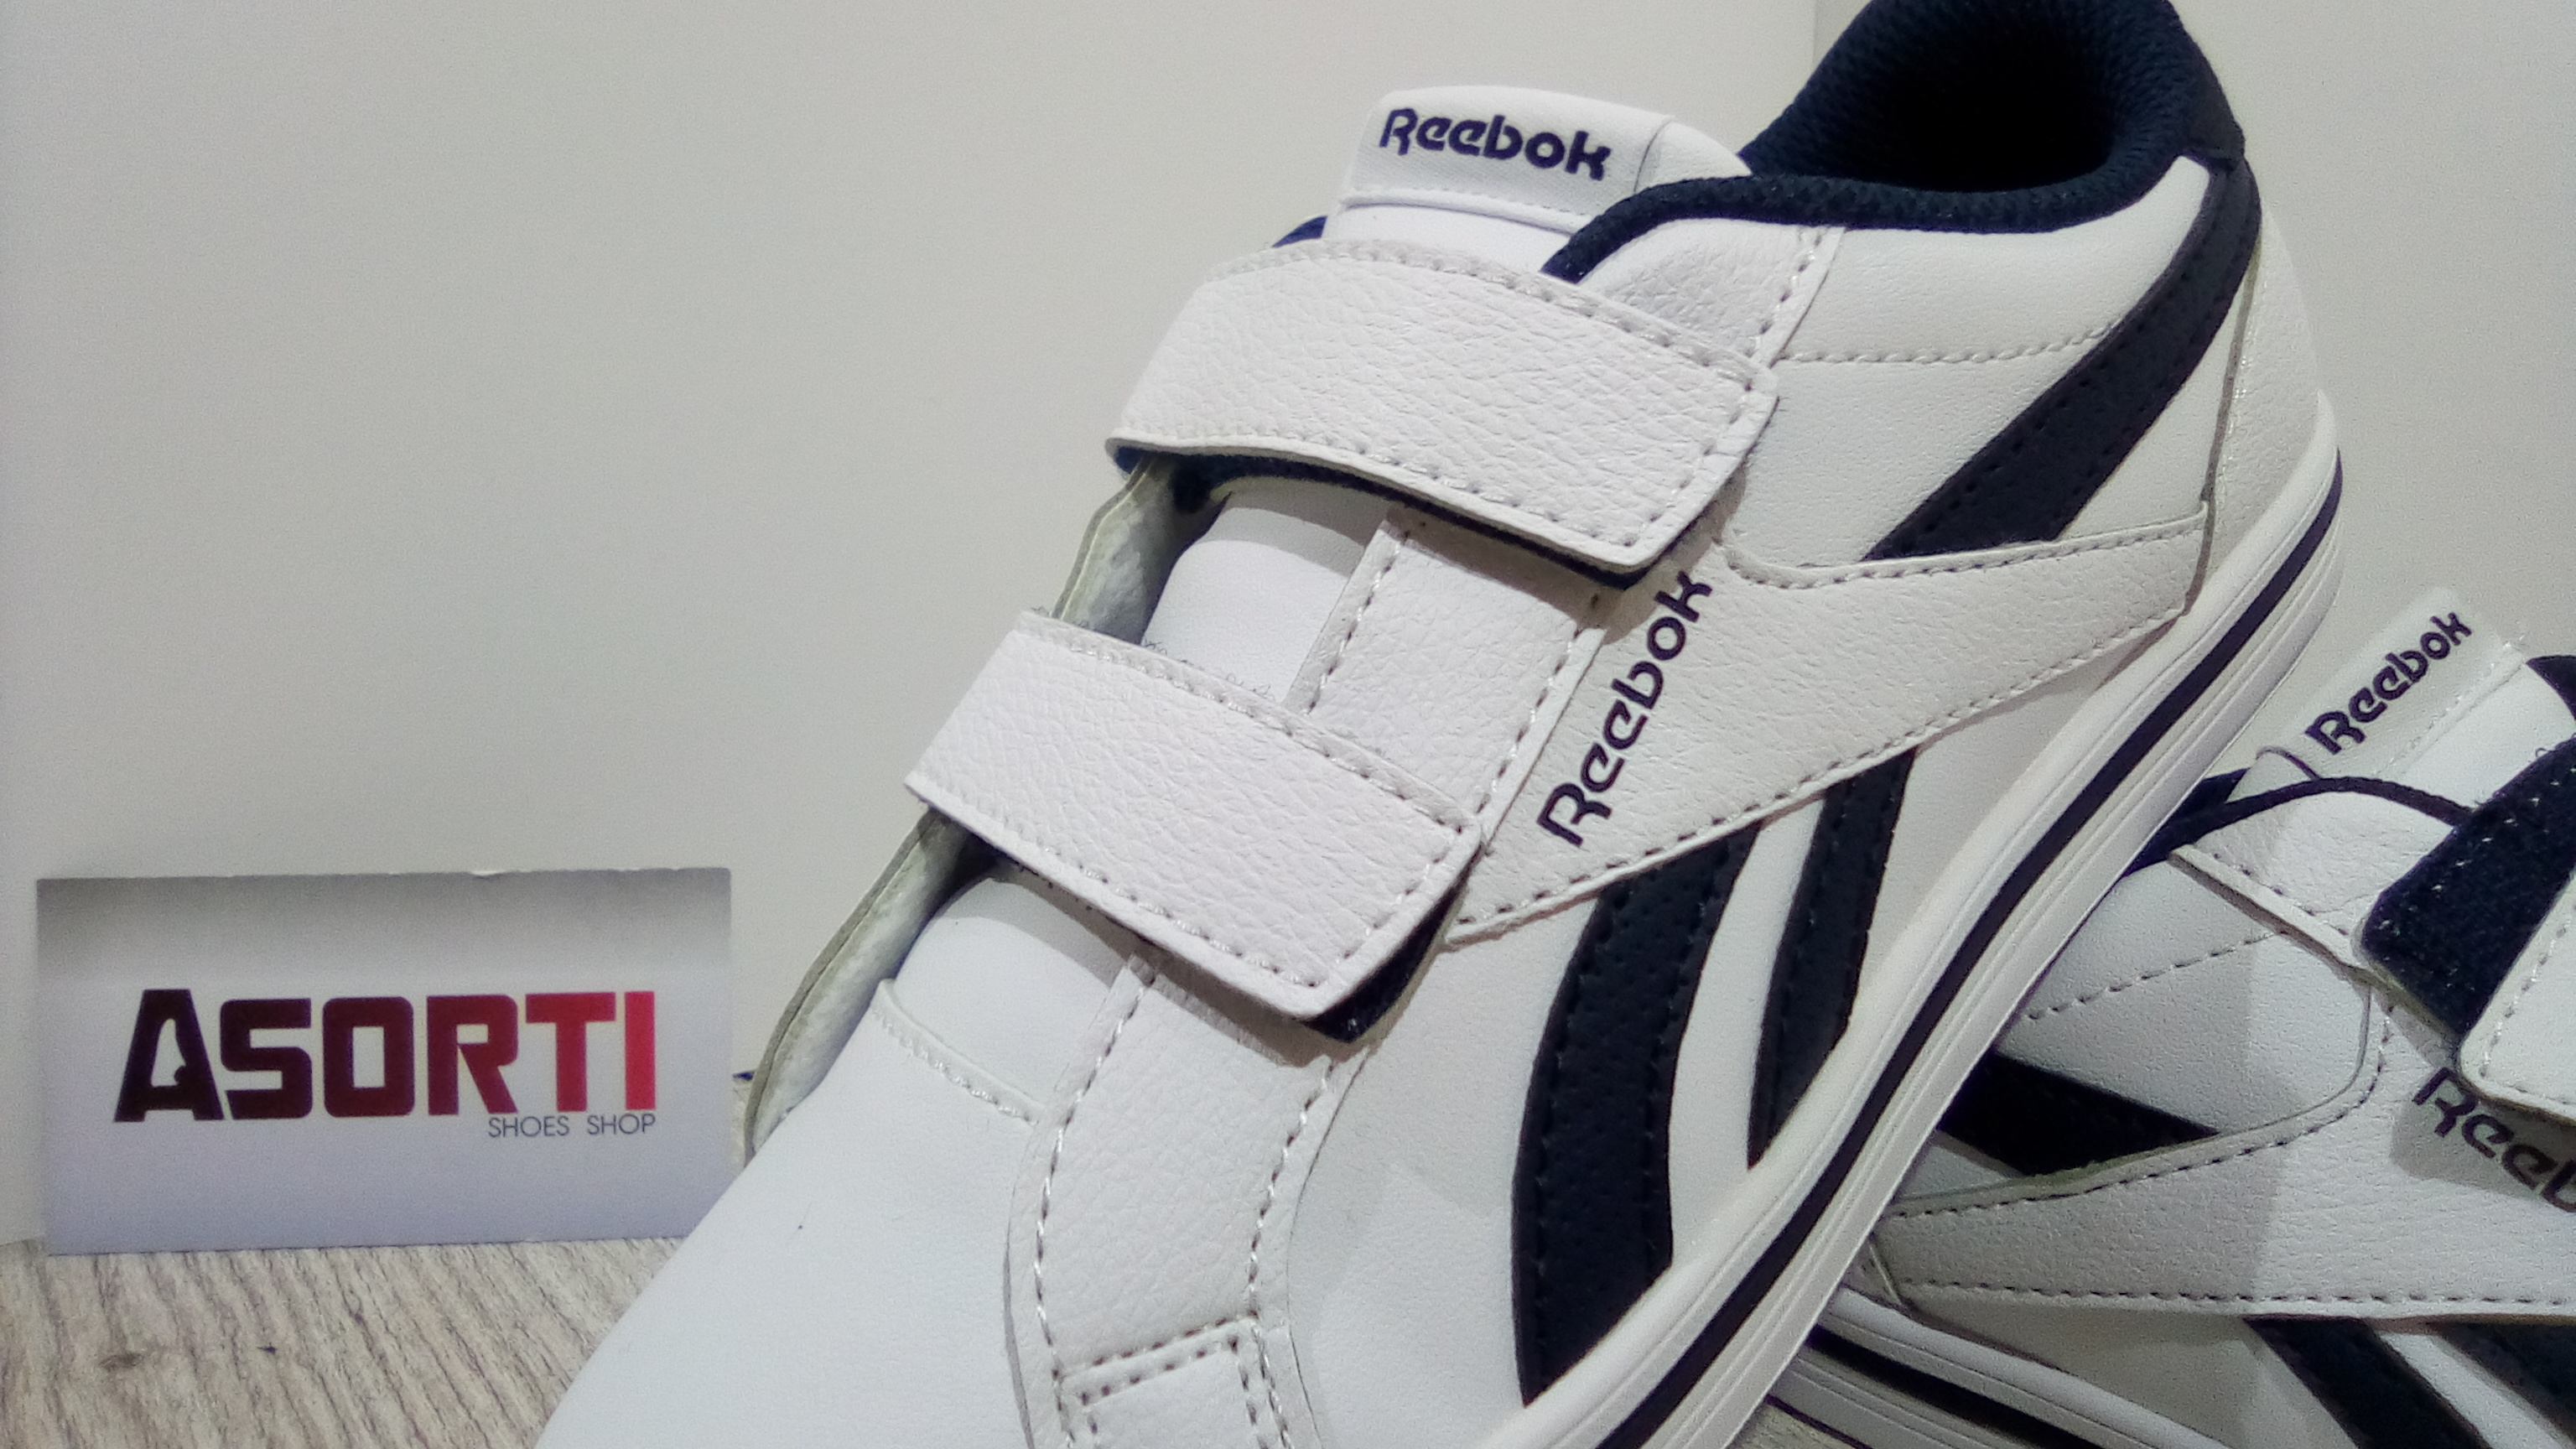 a52041e27b3a27 Детские кроссовки Reebok Royal COMP 2L ALT (CN1702) белые/черные ...